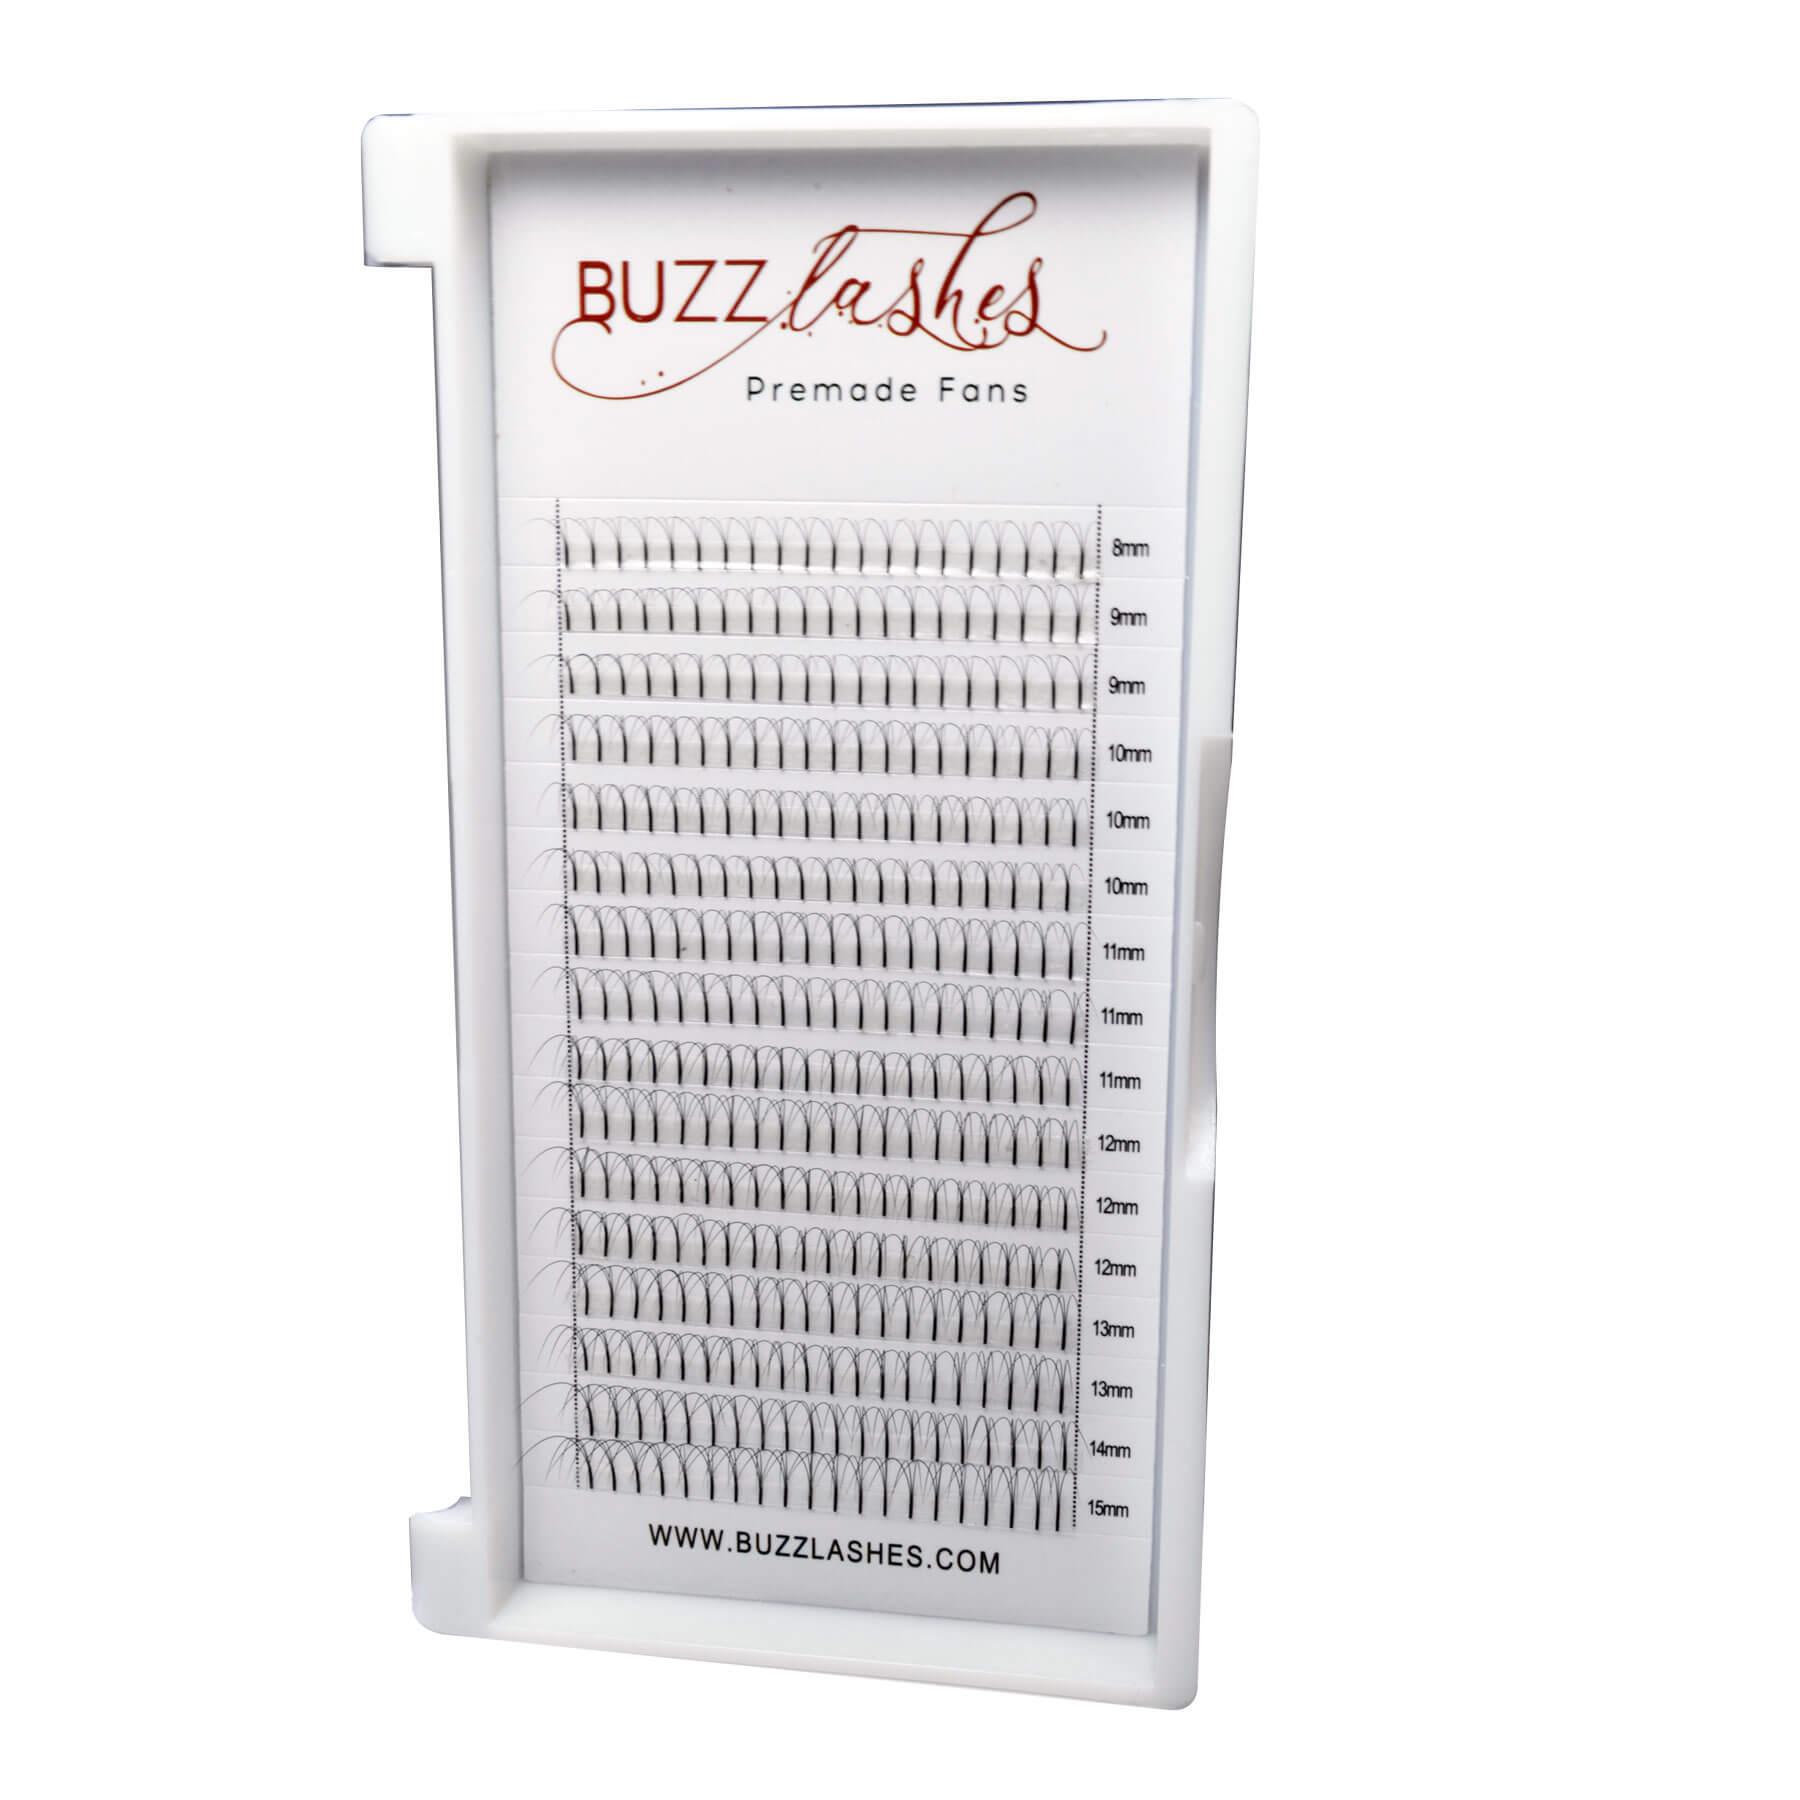 Tufos Buzz Lashes Premade 3D Fans Espessura 0.07mm